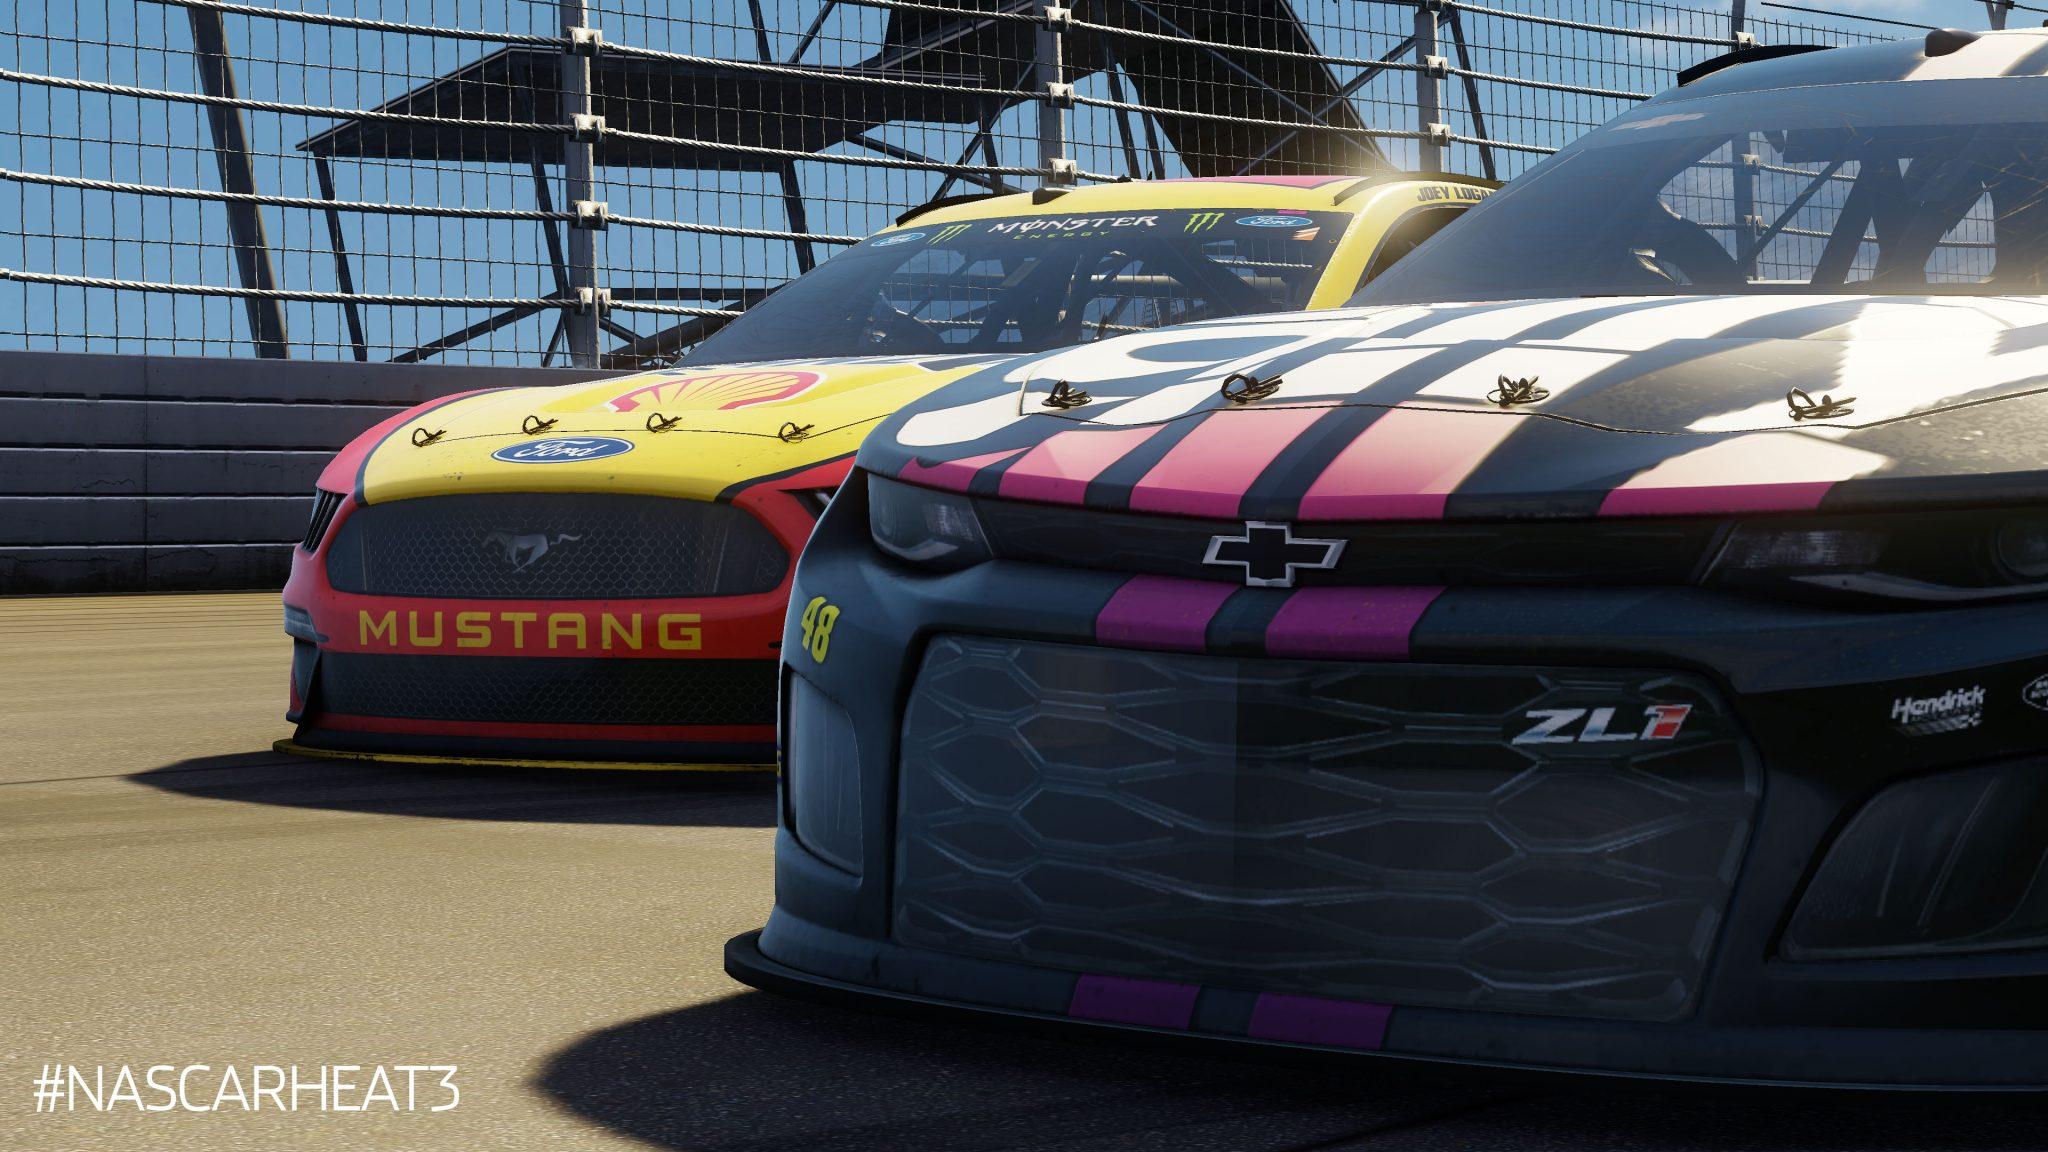 best car racing game xbox 1, jimmie johnson 2019, joey logano 2019, nascar heat, nascar heat 2019 season update, nascar heat 3 dlc, nascar heat dlc update, ps3 nascar heat update,